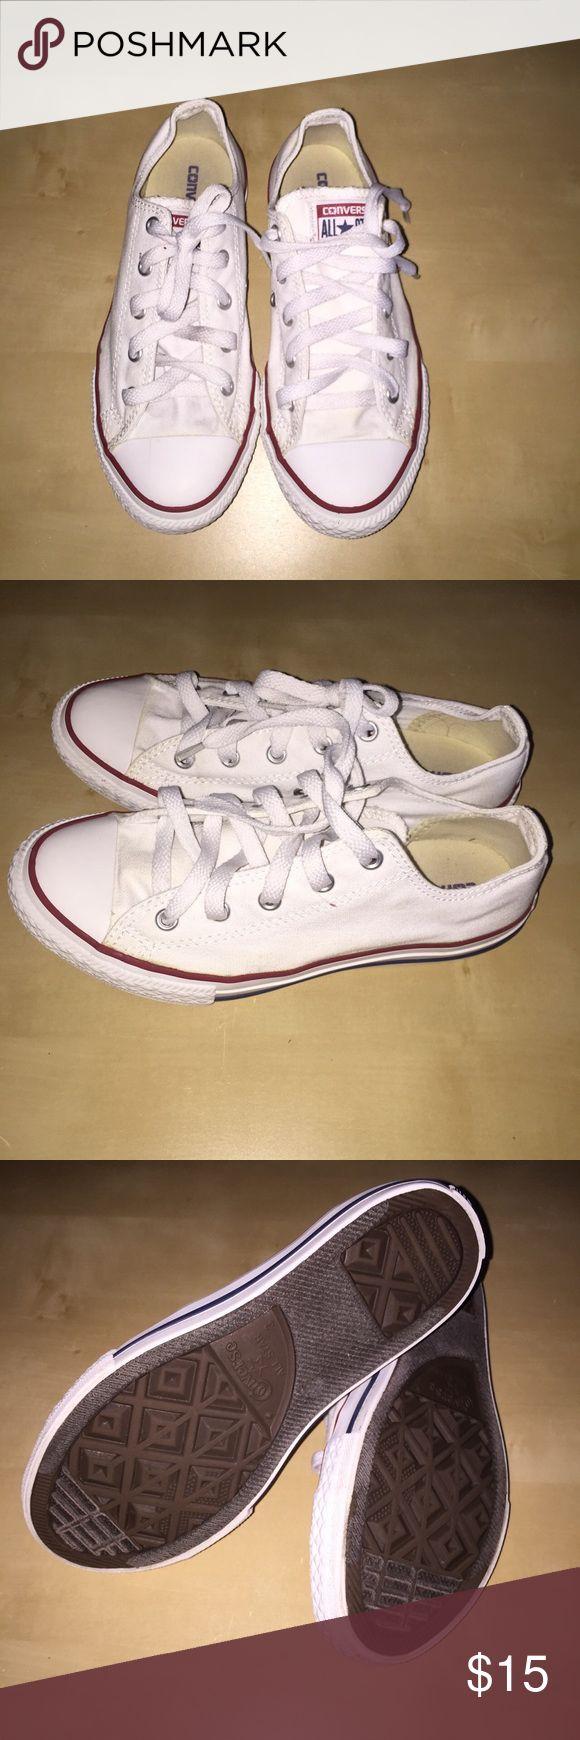 Converse all start White converse Men size 3 women 6 Converse Shoes Sneakers